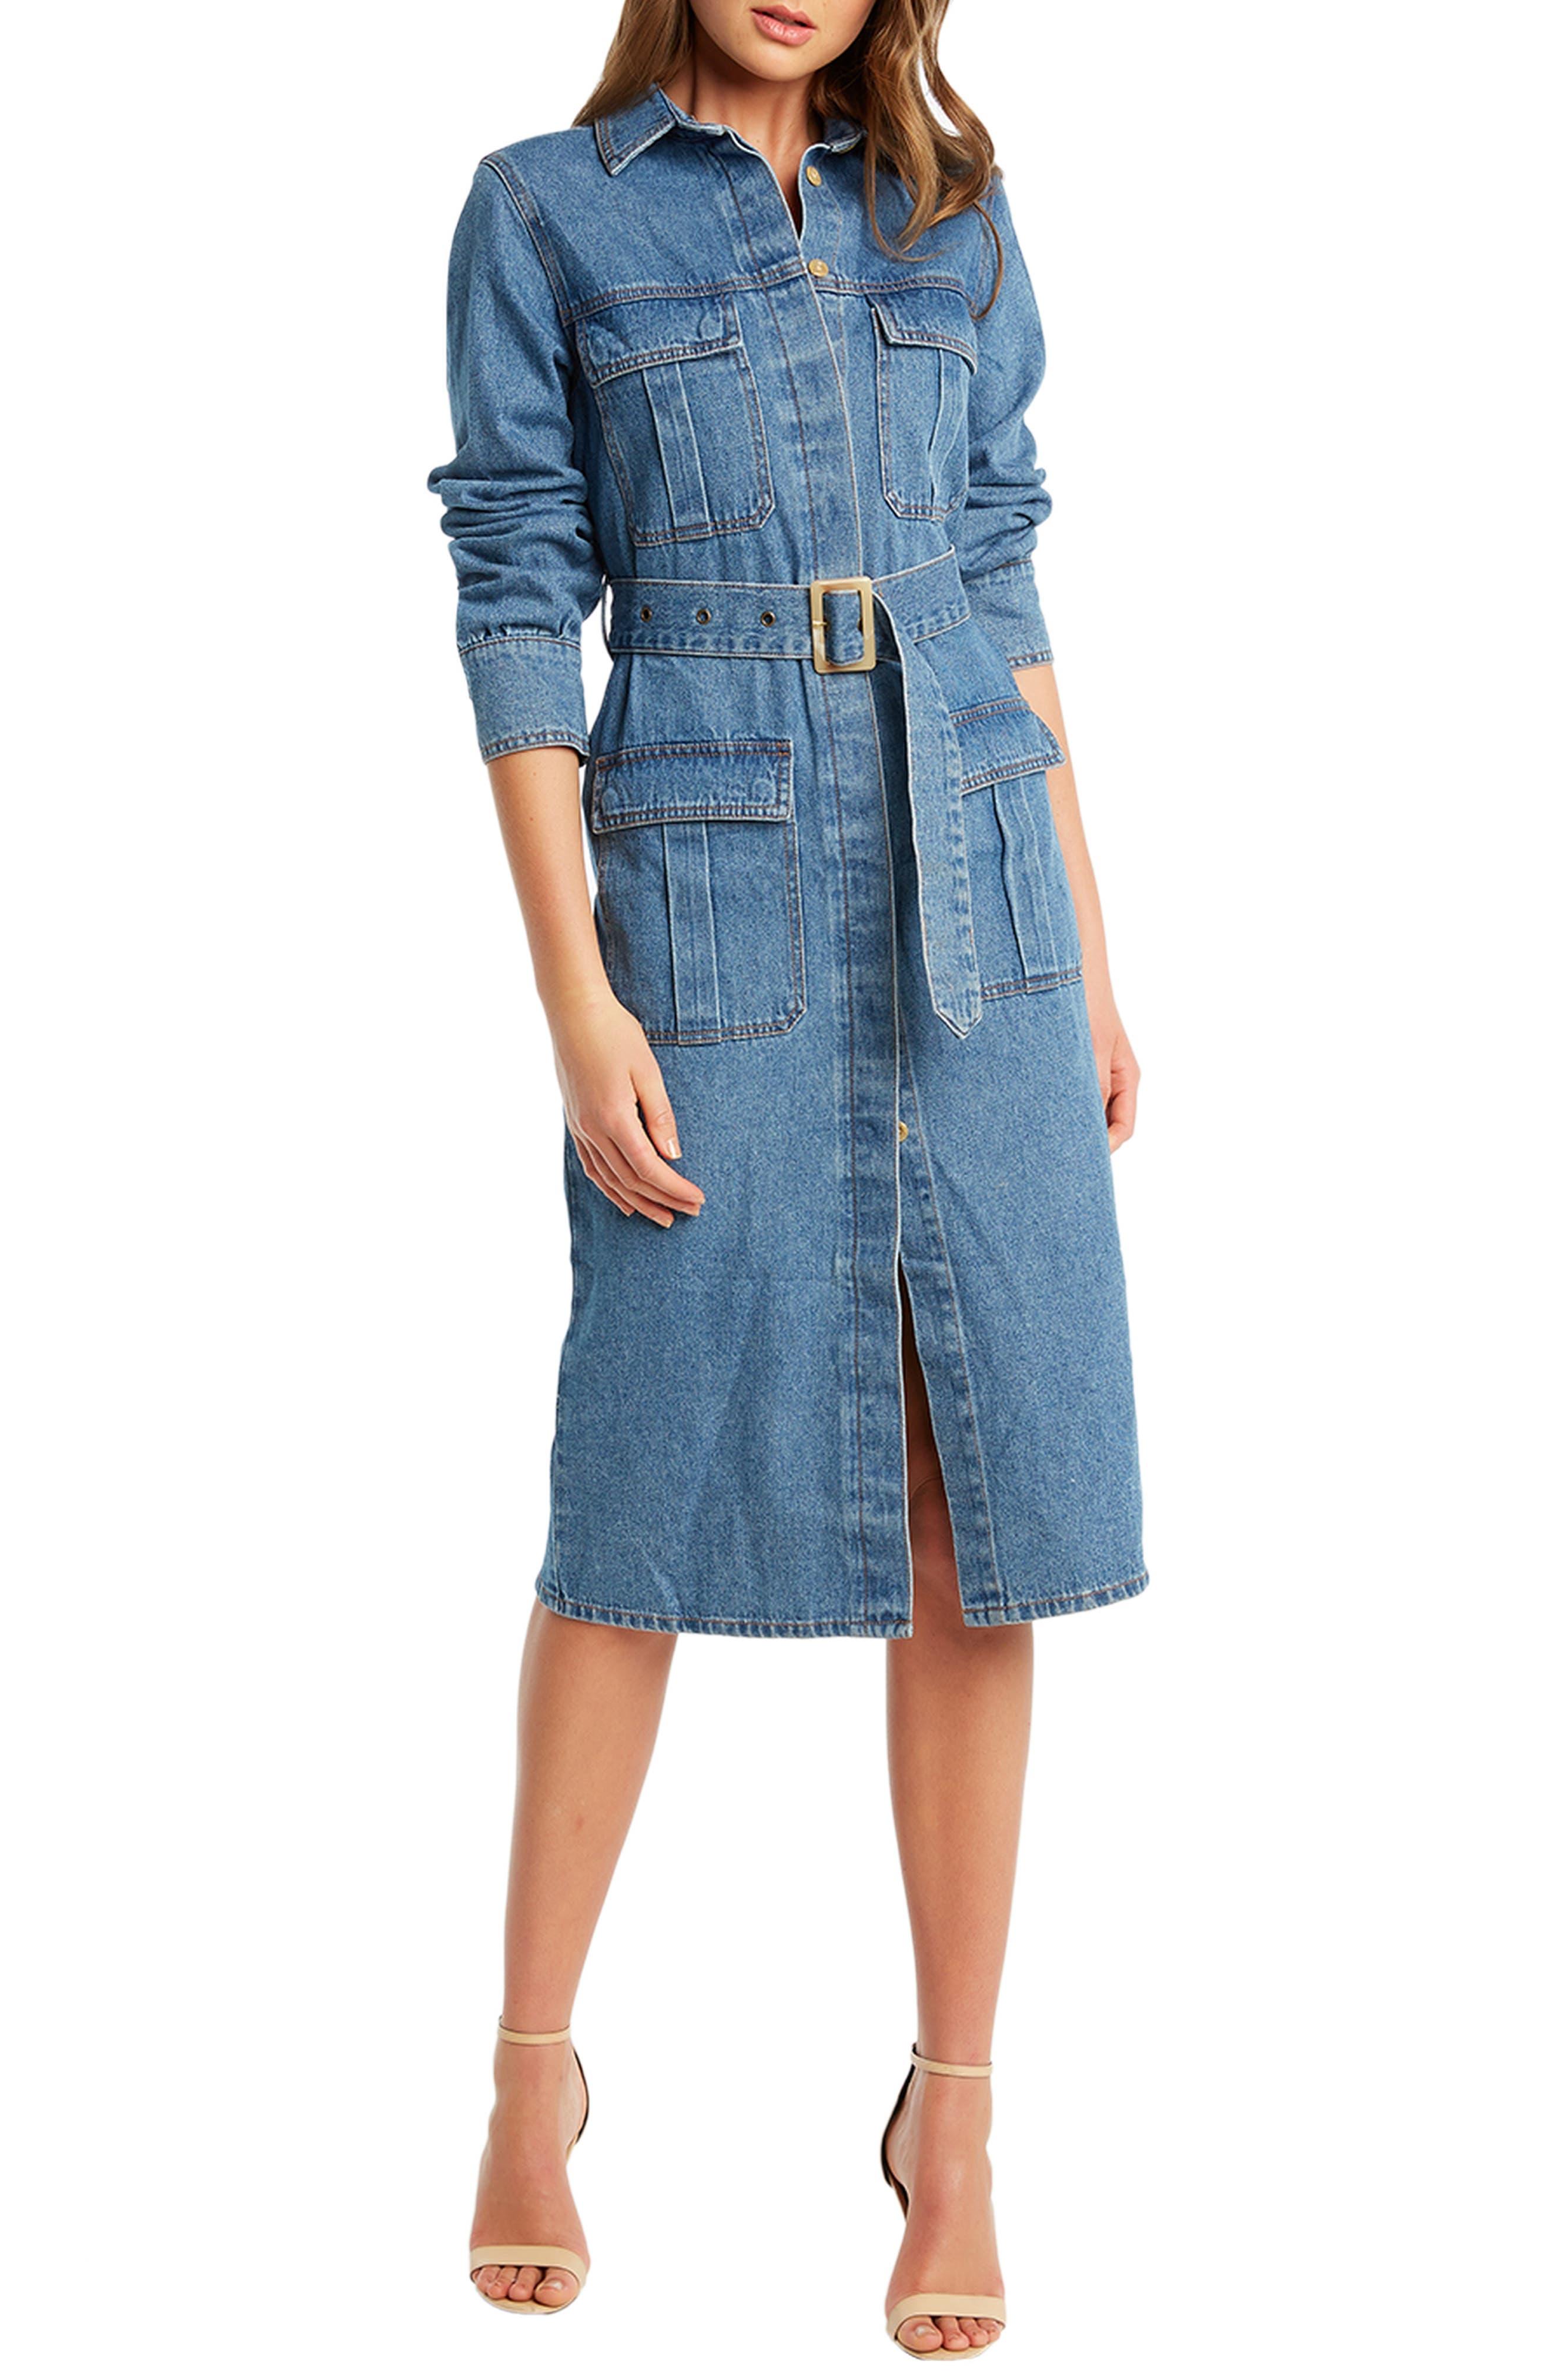 70s Dresses – Disco Dress, Hippie Dress, Wrap Dress Womens Bardot Long Sleeve Denim Shirtdress $109.00 AT vintagedancer.com